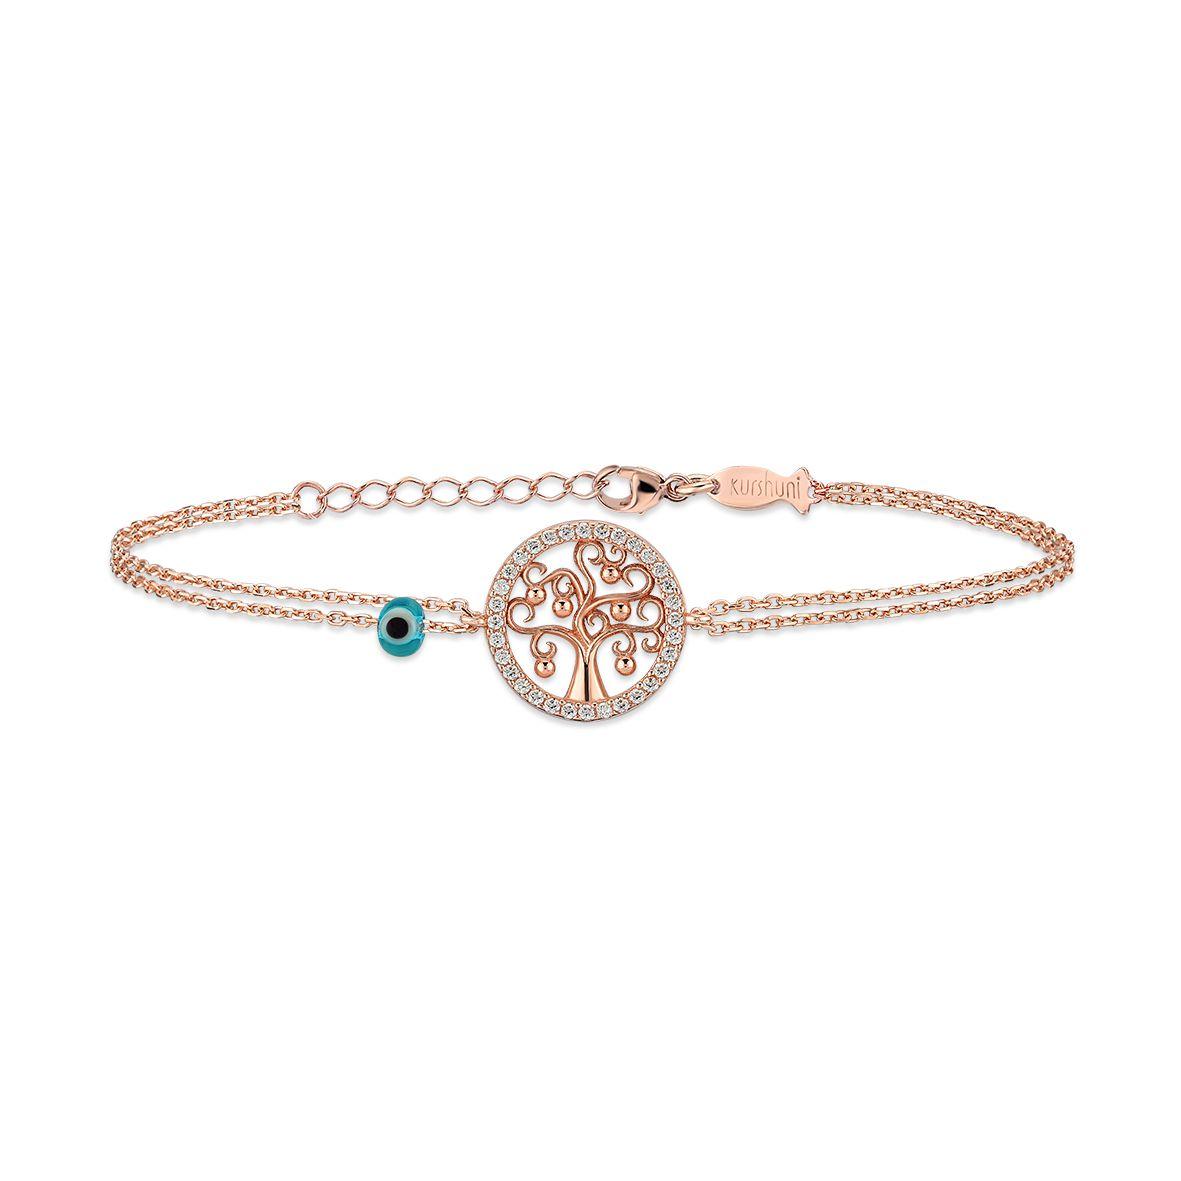 Tree of life, sterling silver bracelet Rosegold Kurshuni